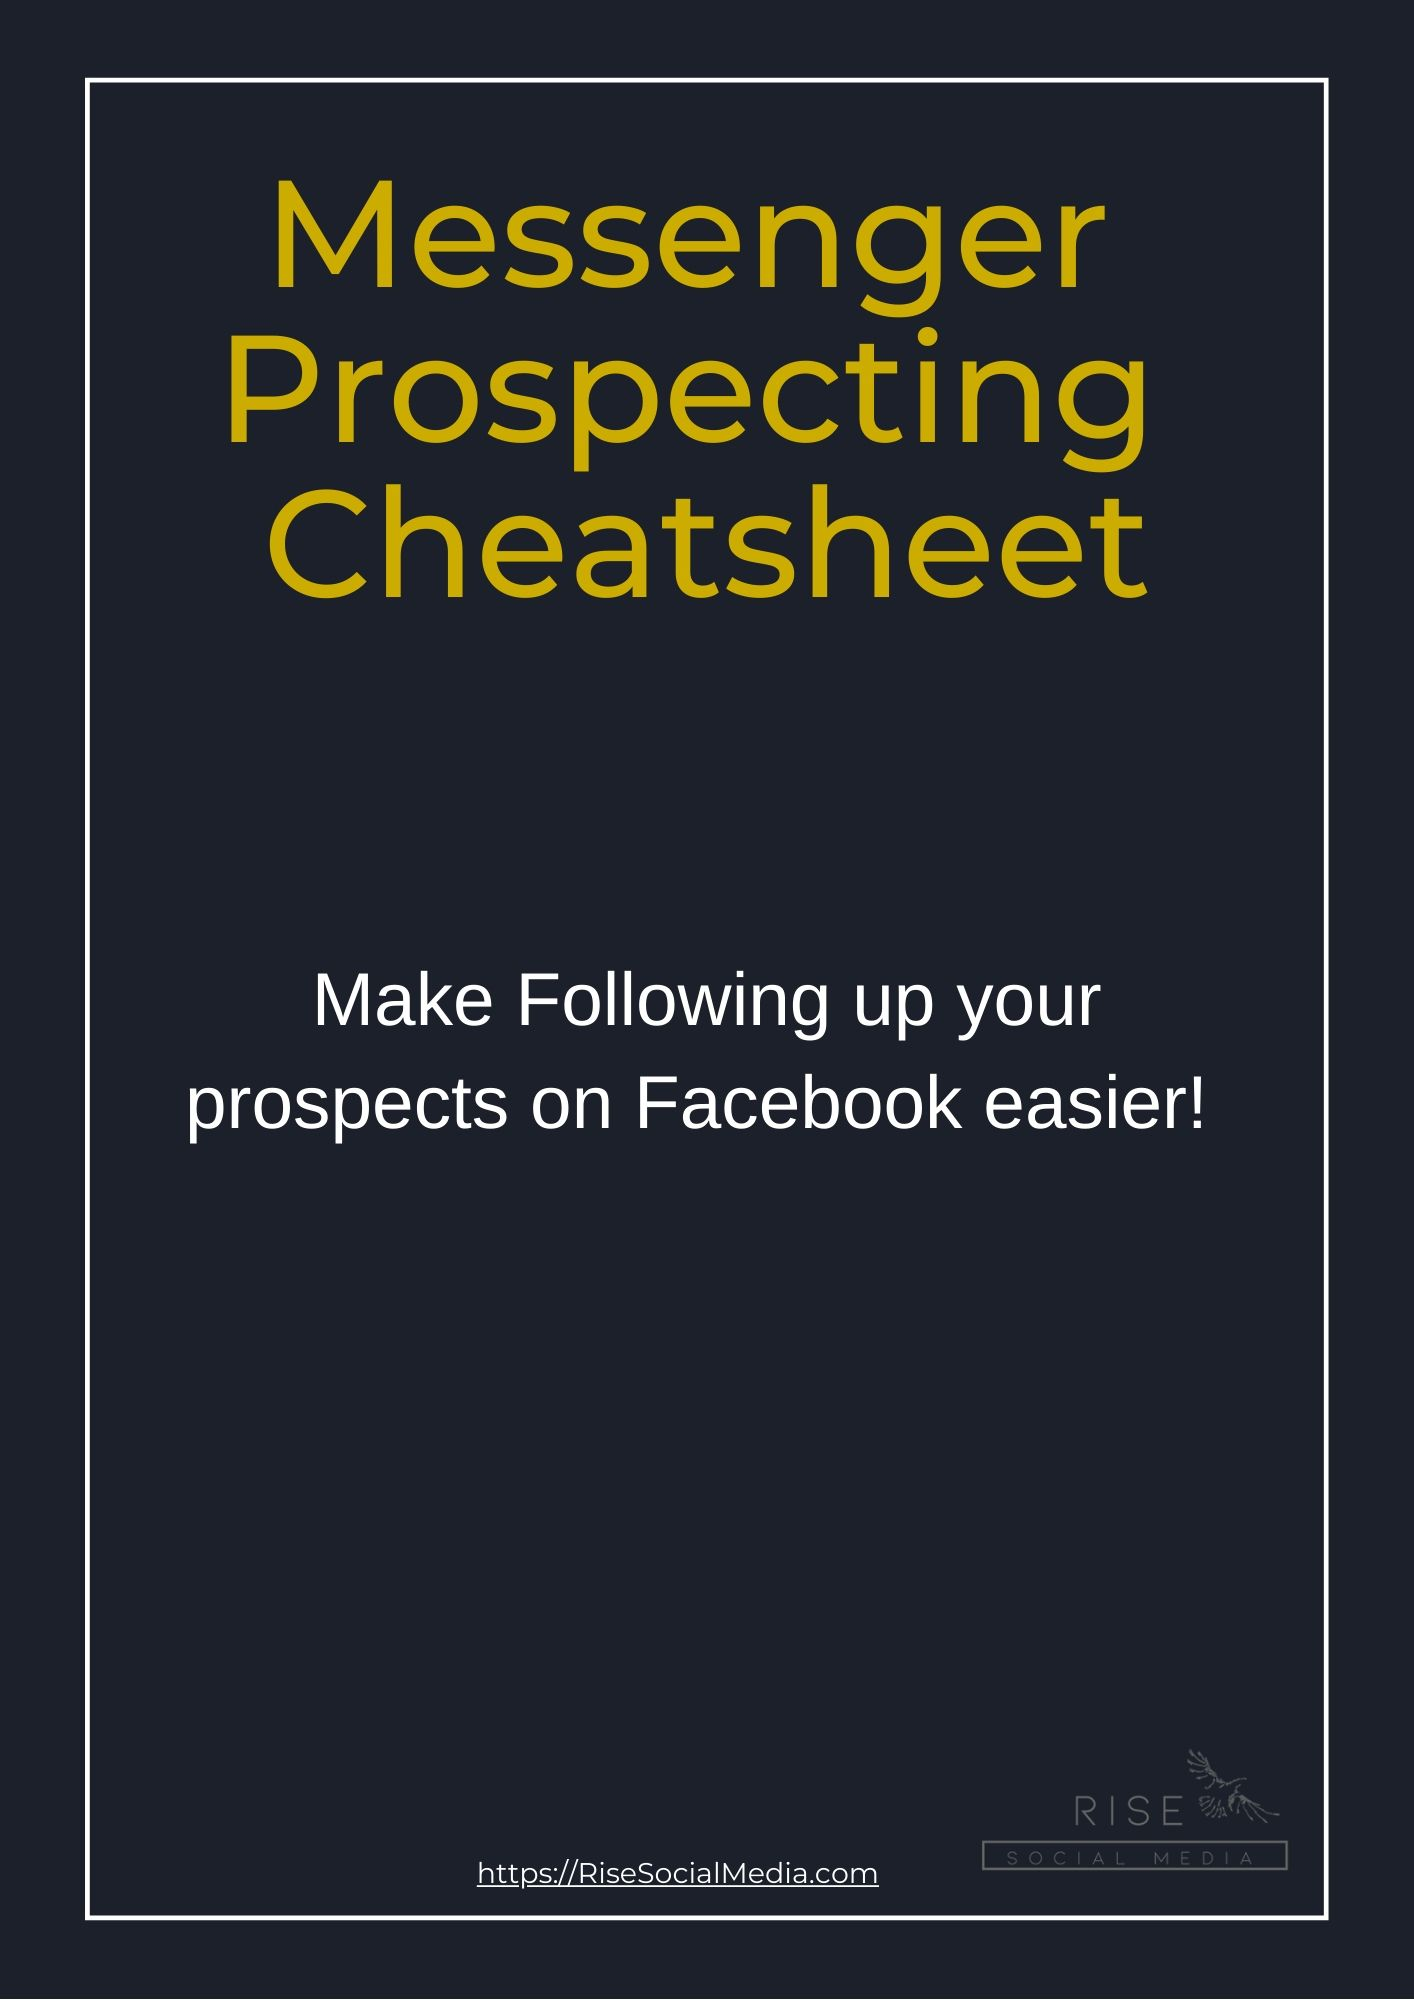 Messenger Prospecting Cheatsheet